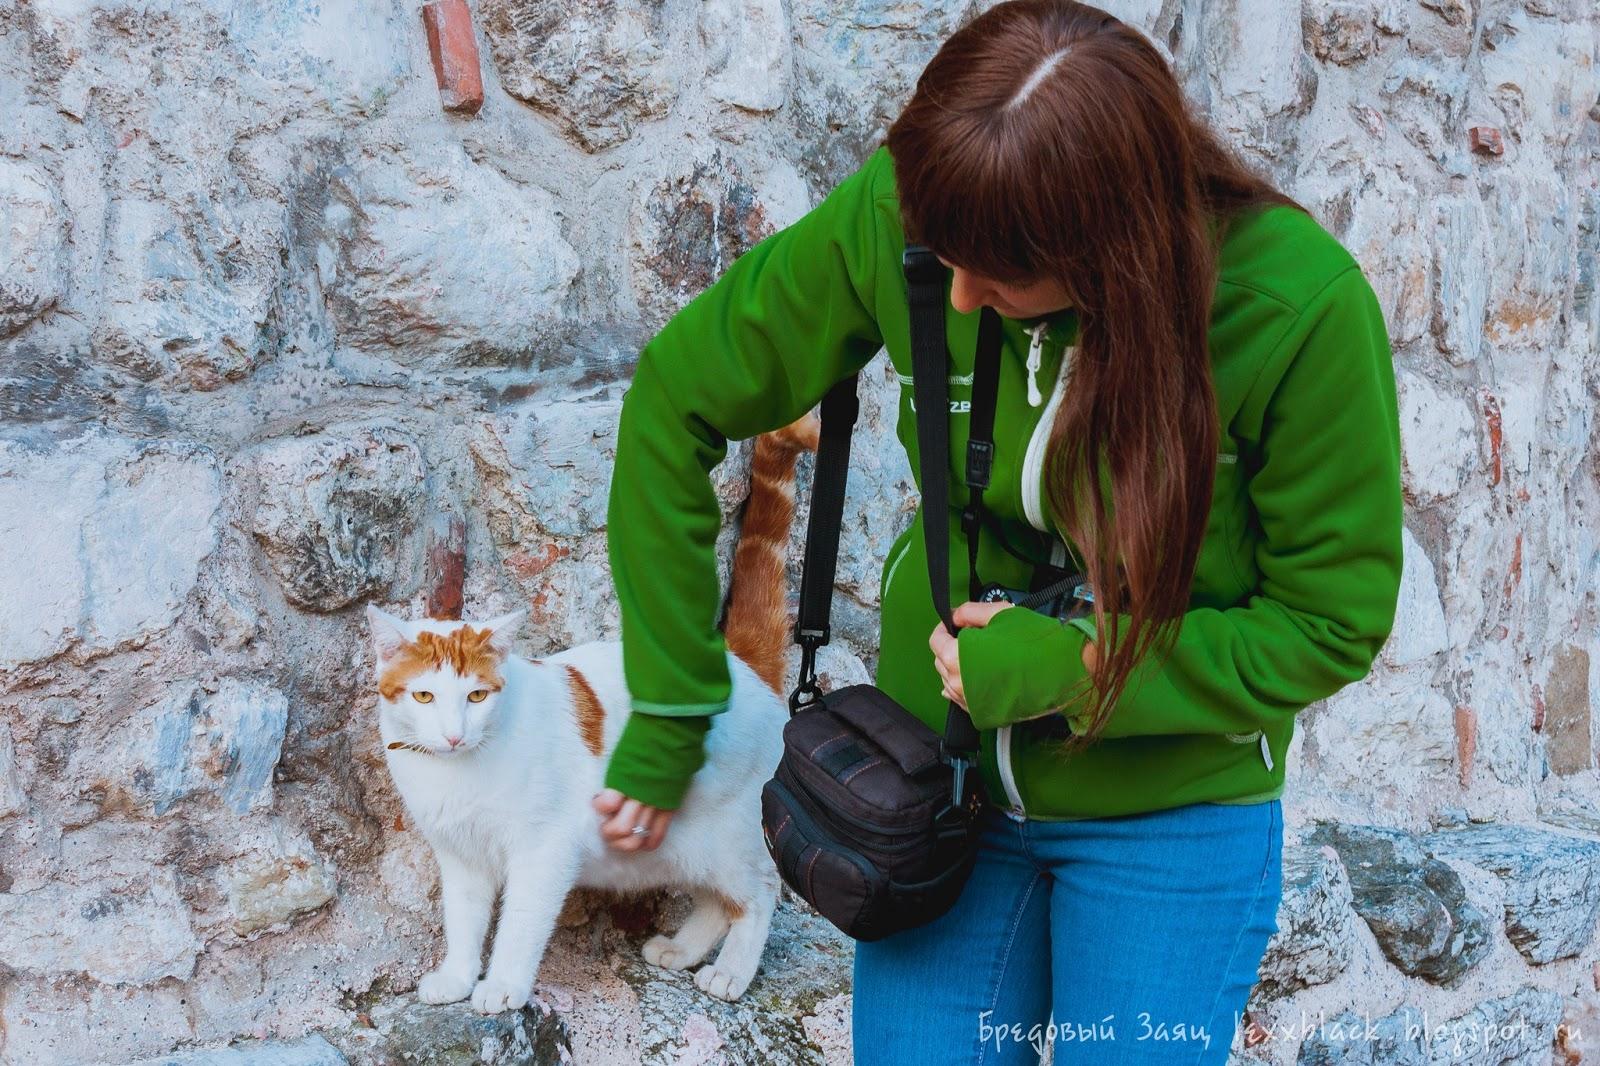 Красивые картинки Леди Баг и Супер-Кот (24 фото